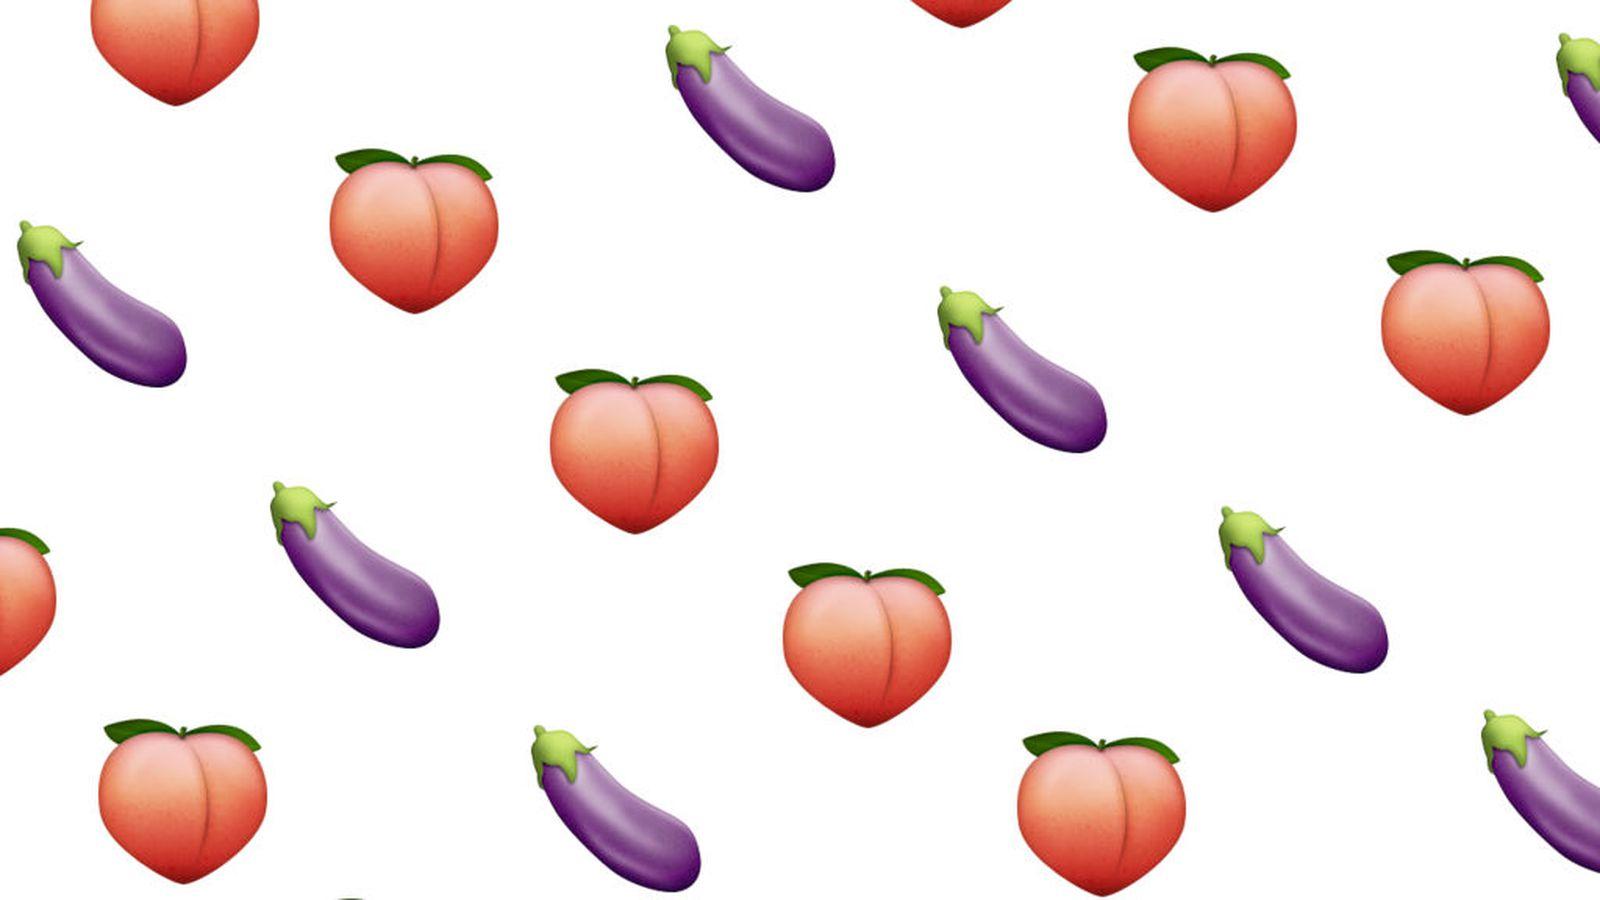 Iphone X Verge Wallpaper Emoji Shouldn T Look Realistic The Verge